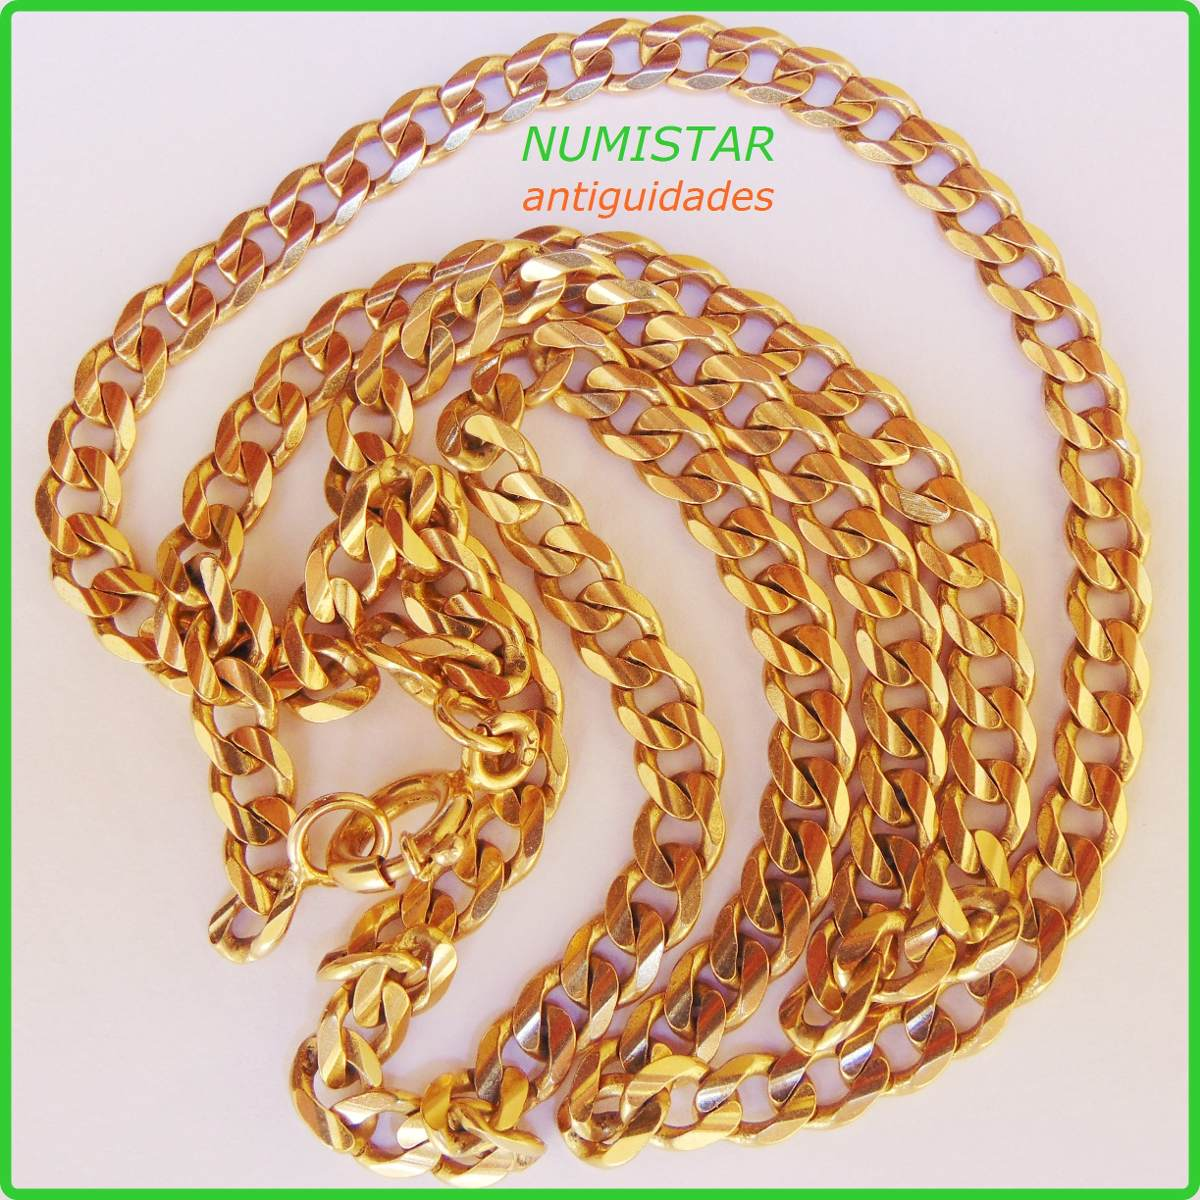 fce5c8742b5 Joia Corrente Grumete Cordão Ouro 800 Acima 18k 750 41.6 Gr. - R ...